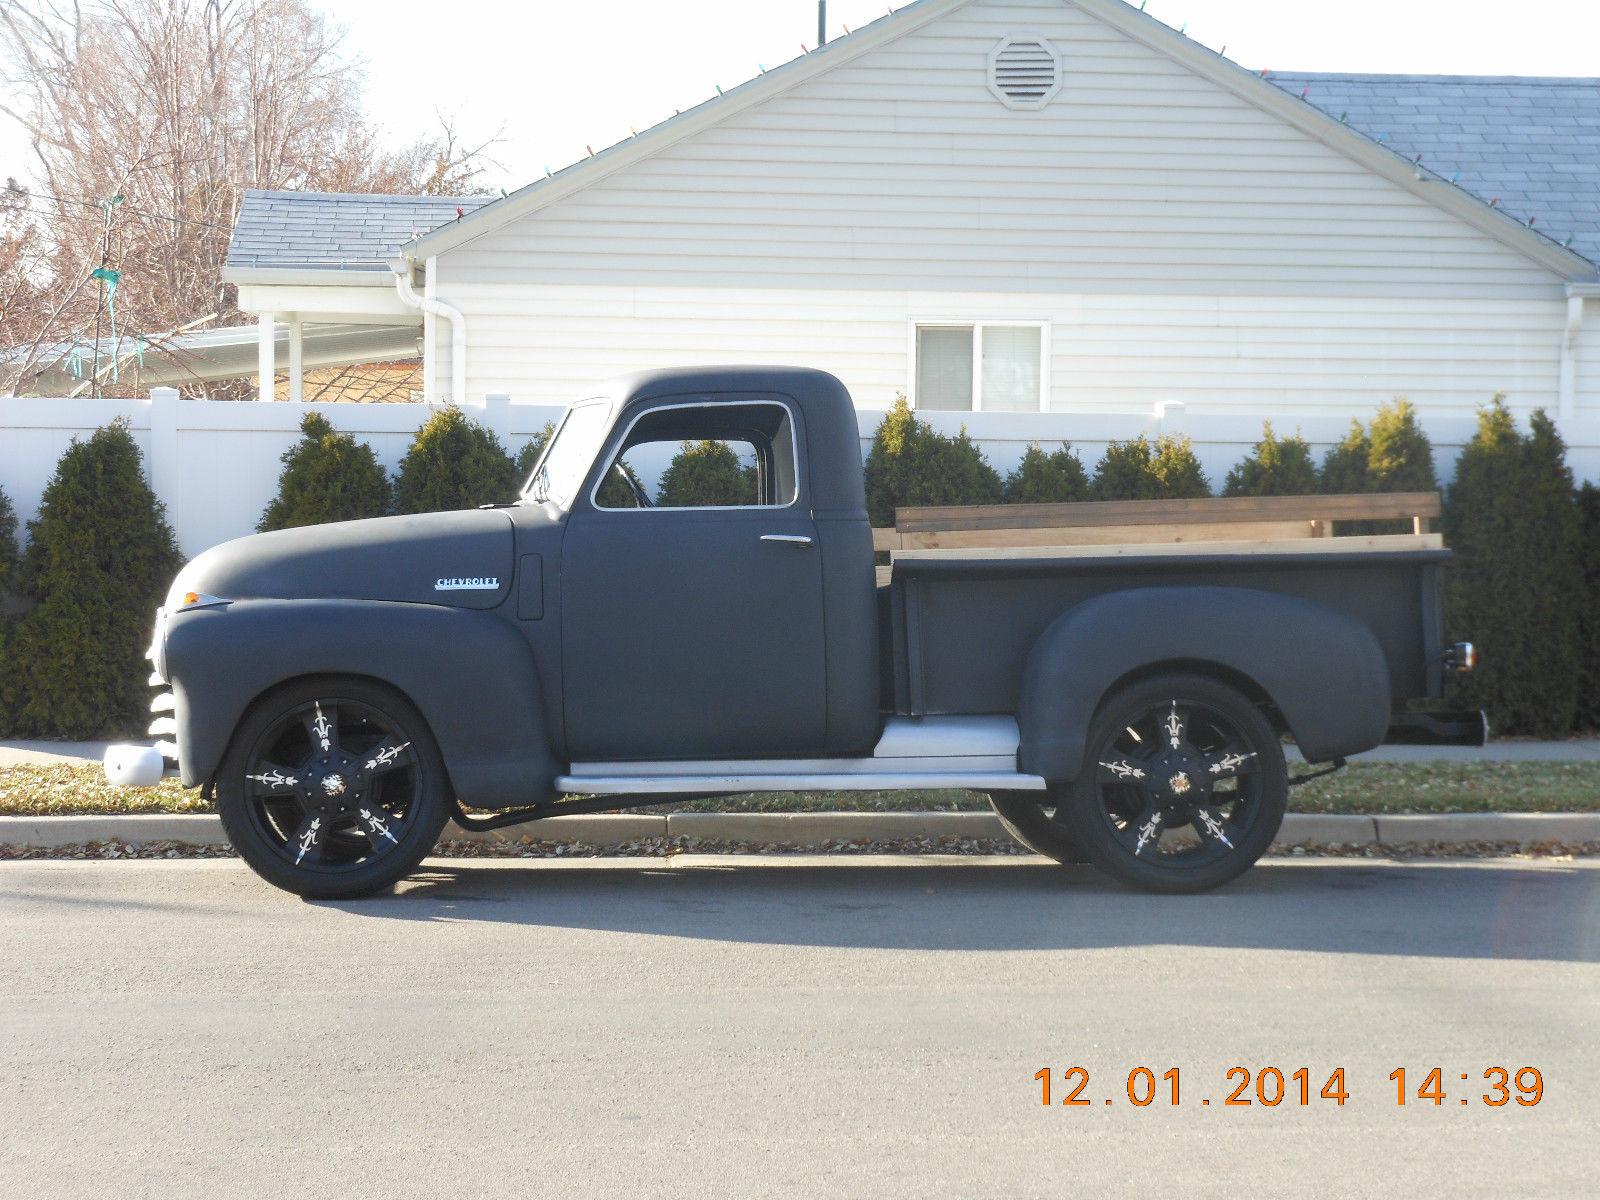 1948 1949 1950 1951 1952 1953 1954 Frame Off Restored Chevy 1 2 Pickup Truck Chevrolet Other Pickups Thrift Master Resto